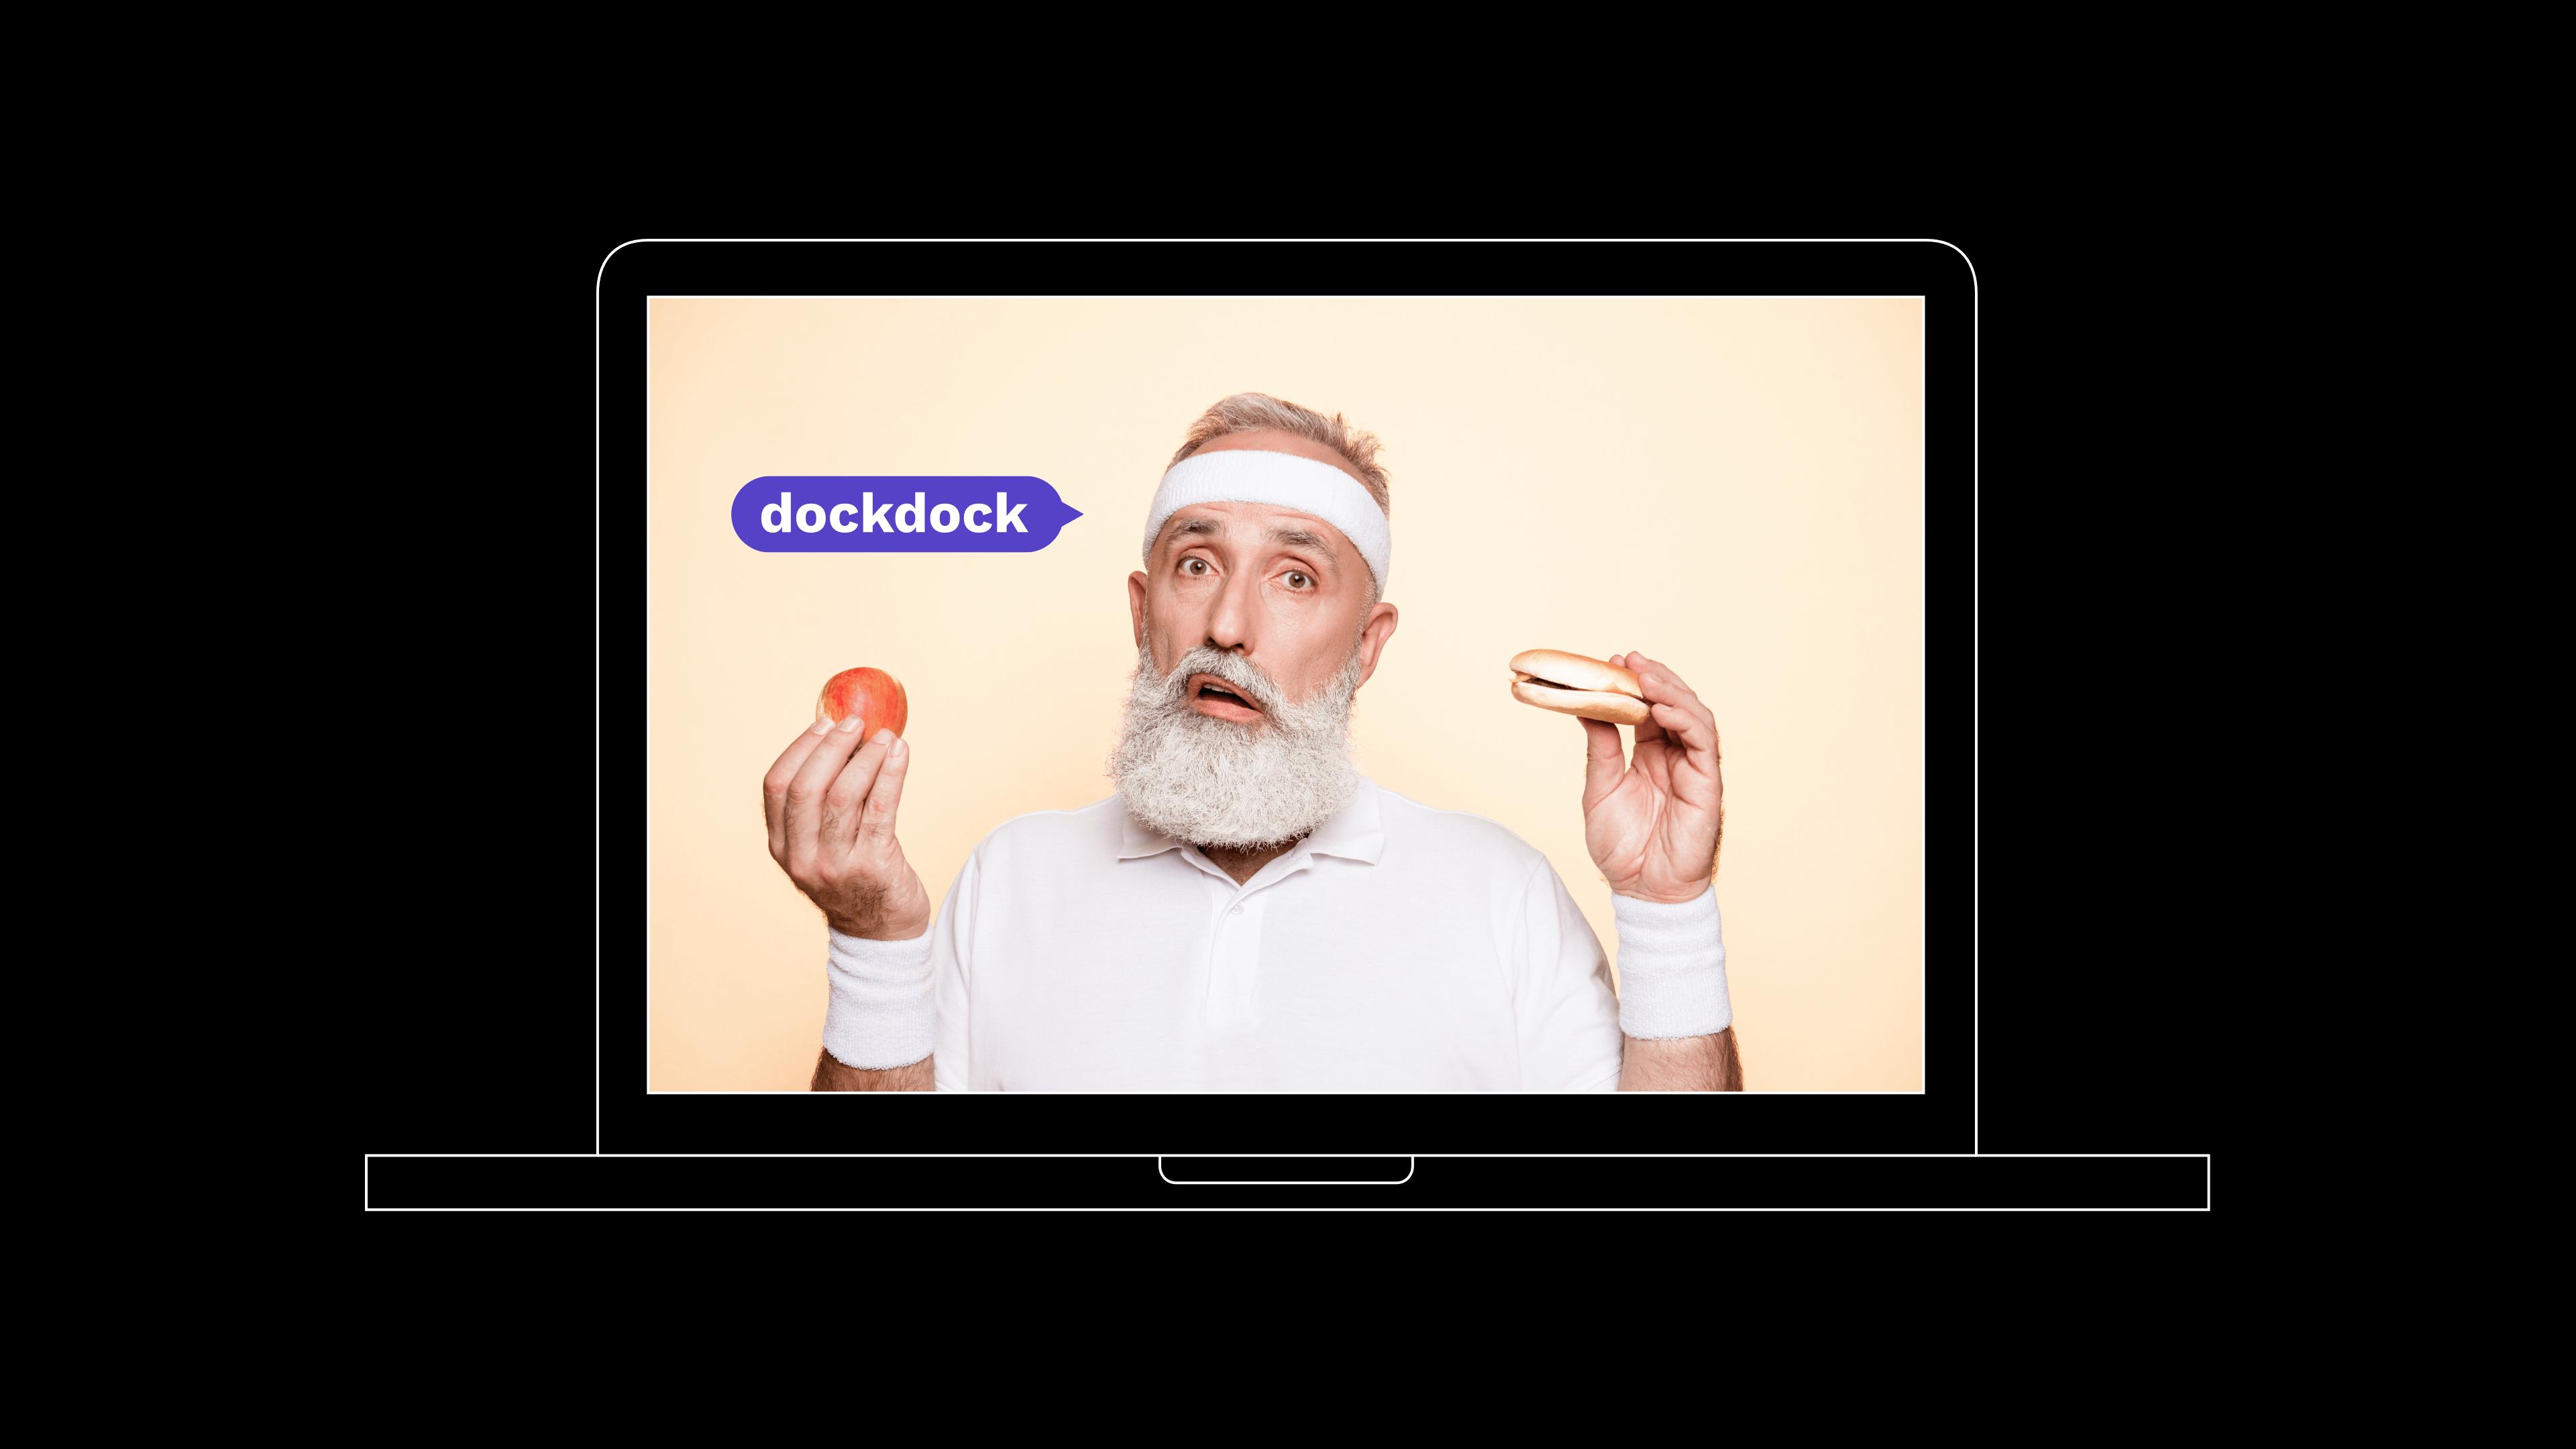 dockdock identity